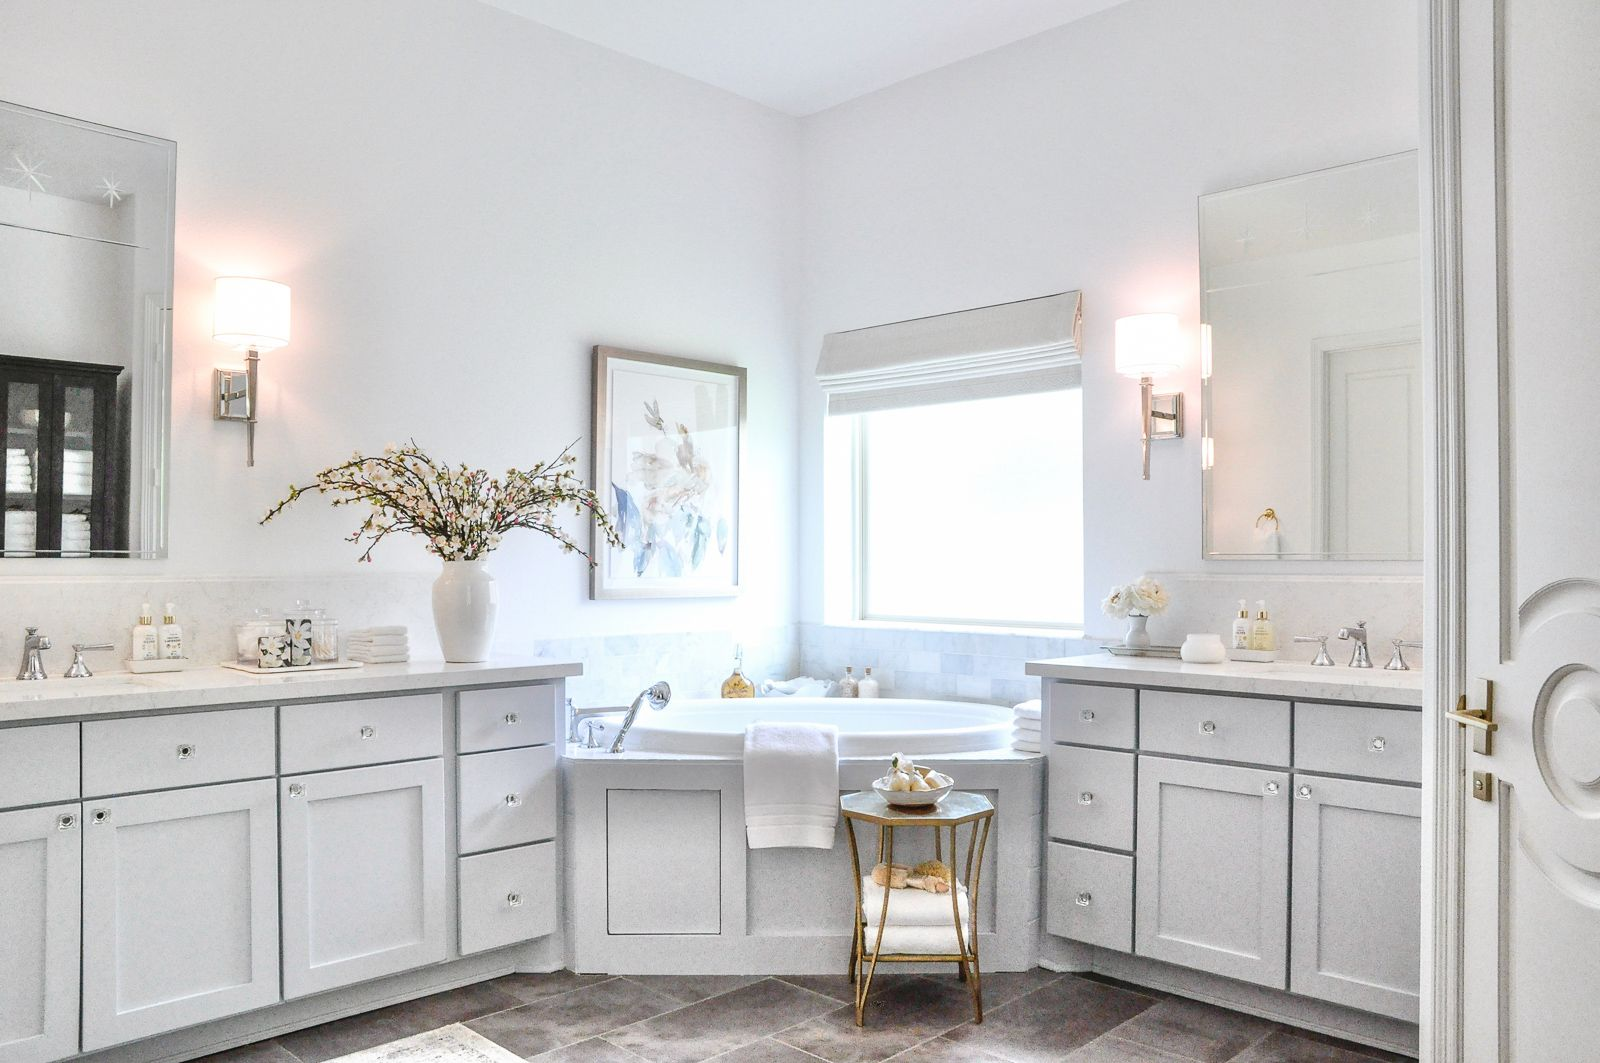 Master bathroom bright beautiful reveal #interiordecor #homeinspo #inspohome #decoratingideas #decorinspiration #homedetails  #homedecor #masterbathroom #bathrooms #bathroomdecor #bathroomdesign #interiorinspo #decor #decorating #styleathome #houseandhome #transitionaldecor